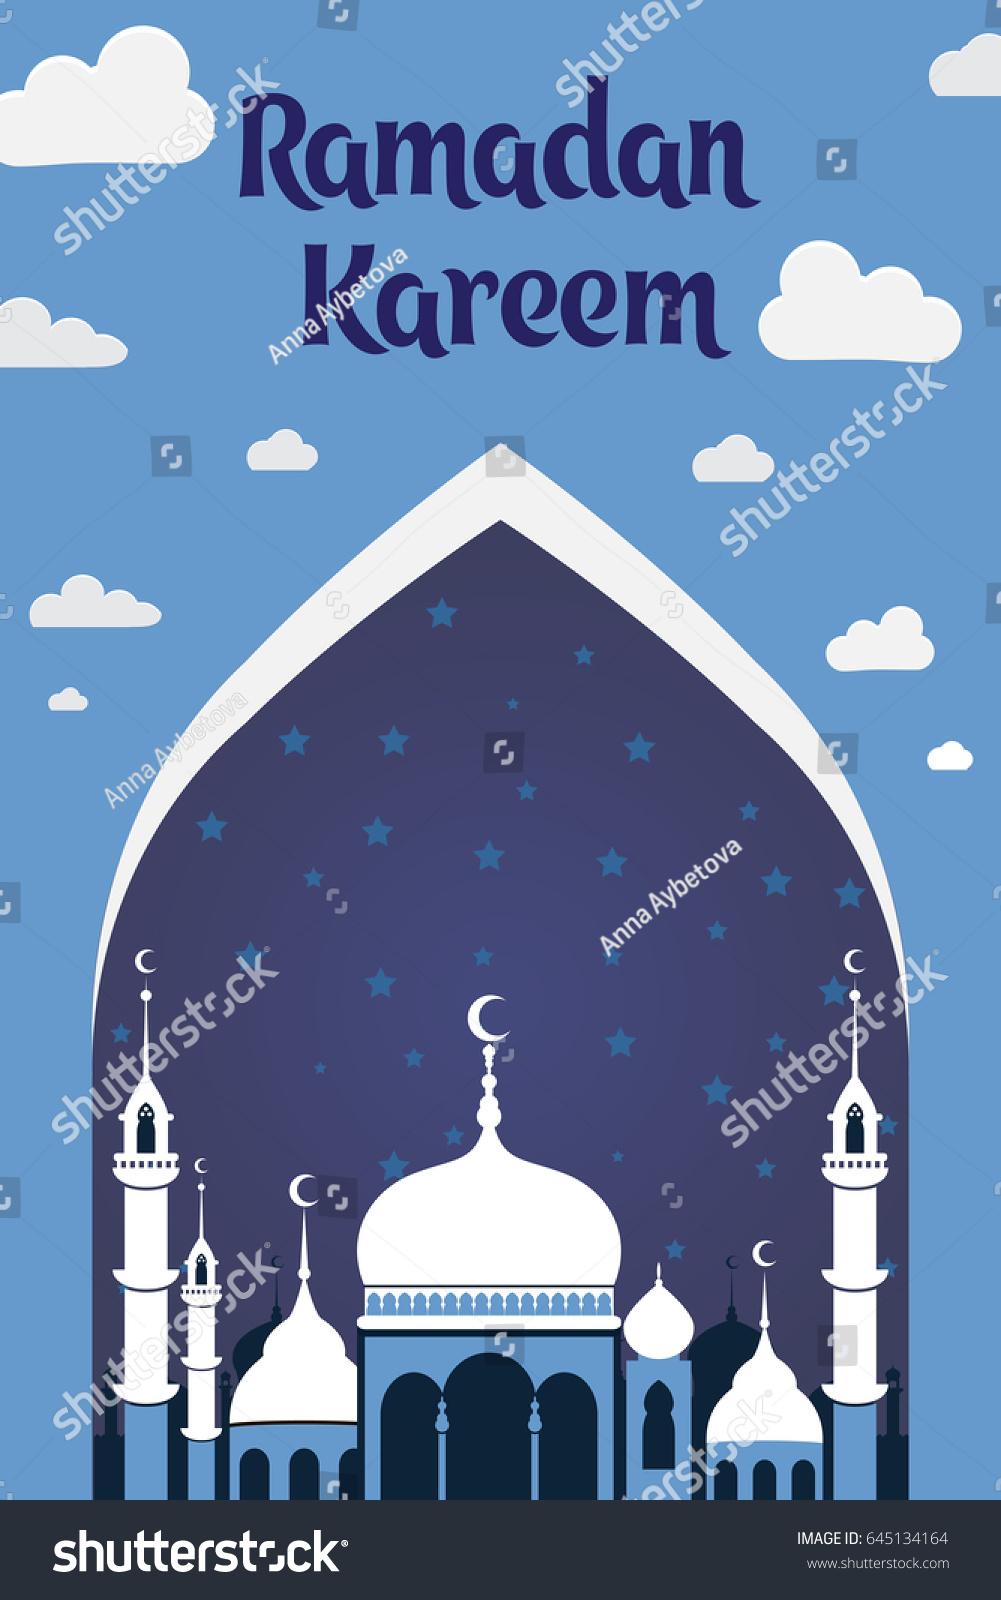 Download Id Festival Eid Al-Fitr Greeting - stock-photo-crescent-moon-for-muslim-community-festival-eid-al-fitr-mubarak-greeting-card-template-645134164  HD_921889 .jpg